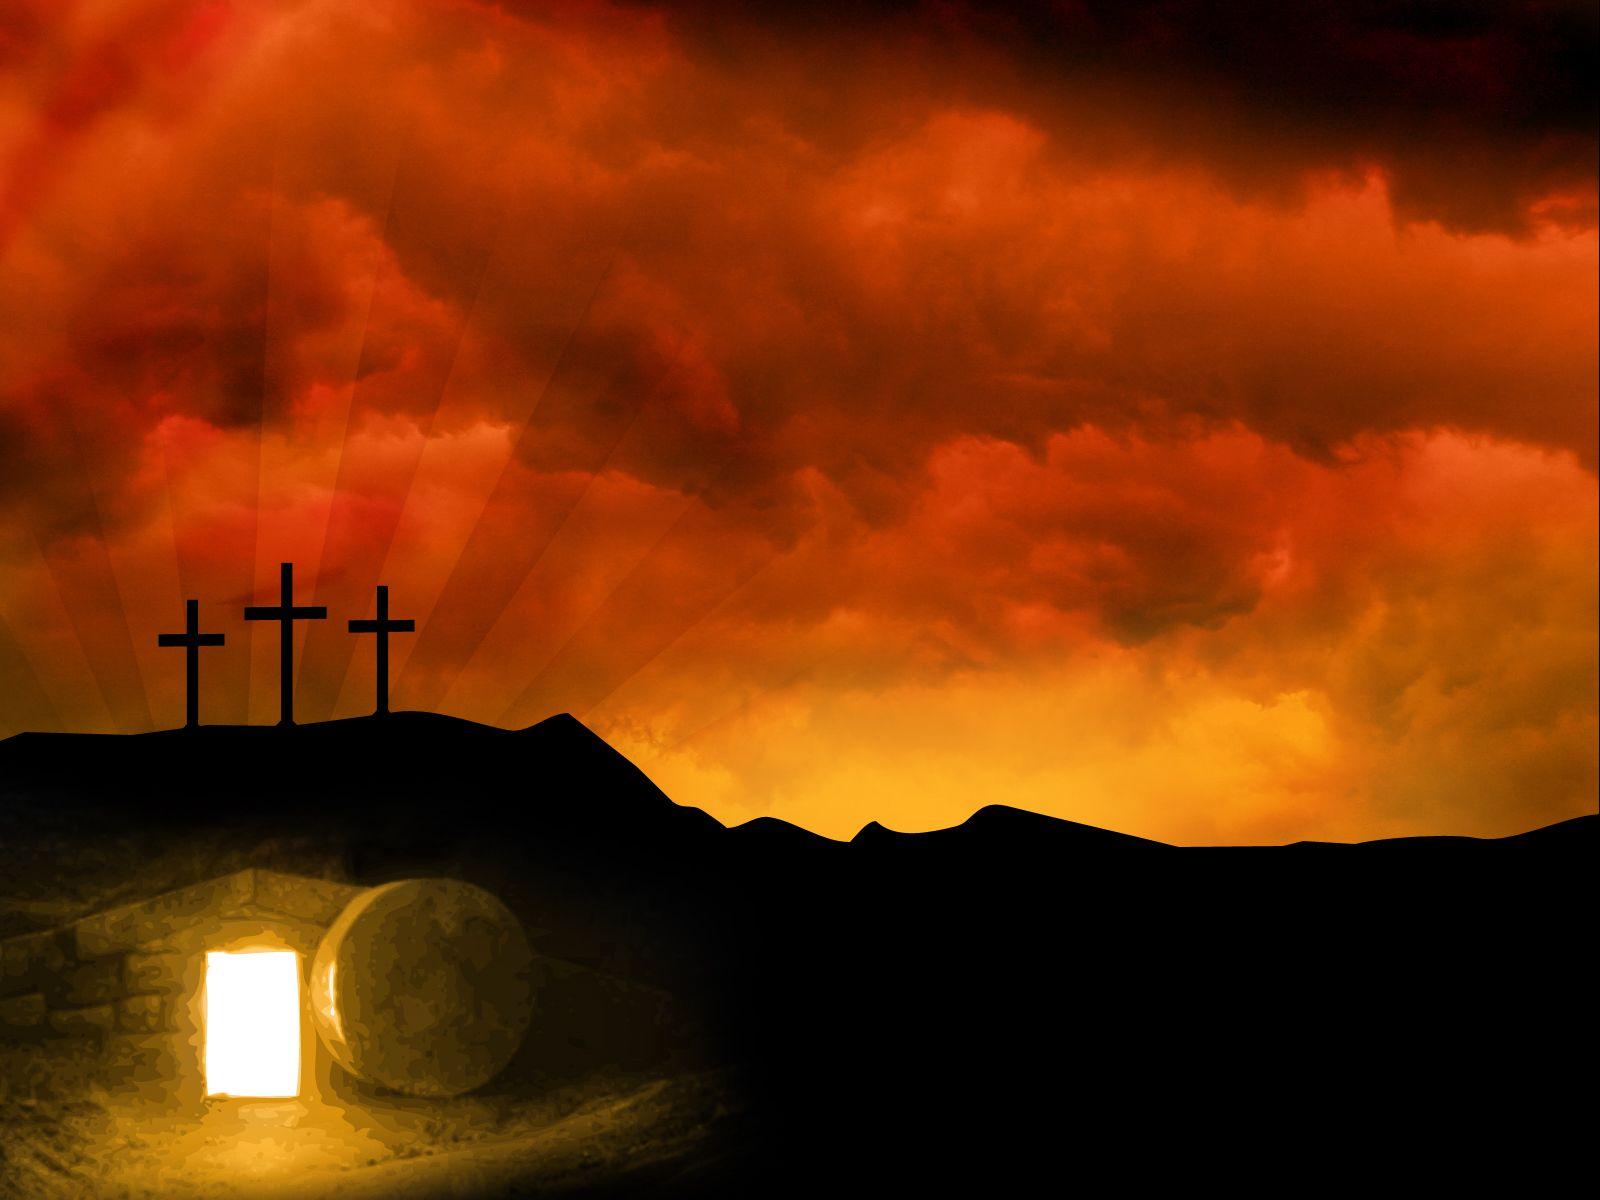 easter resurrection background free large images inspirational